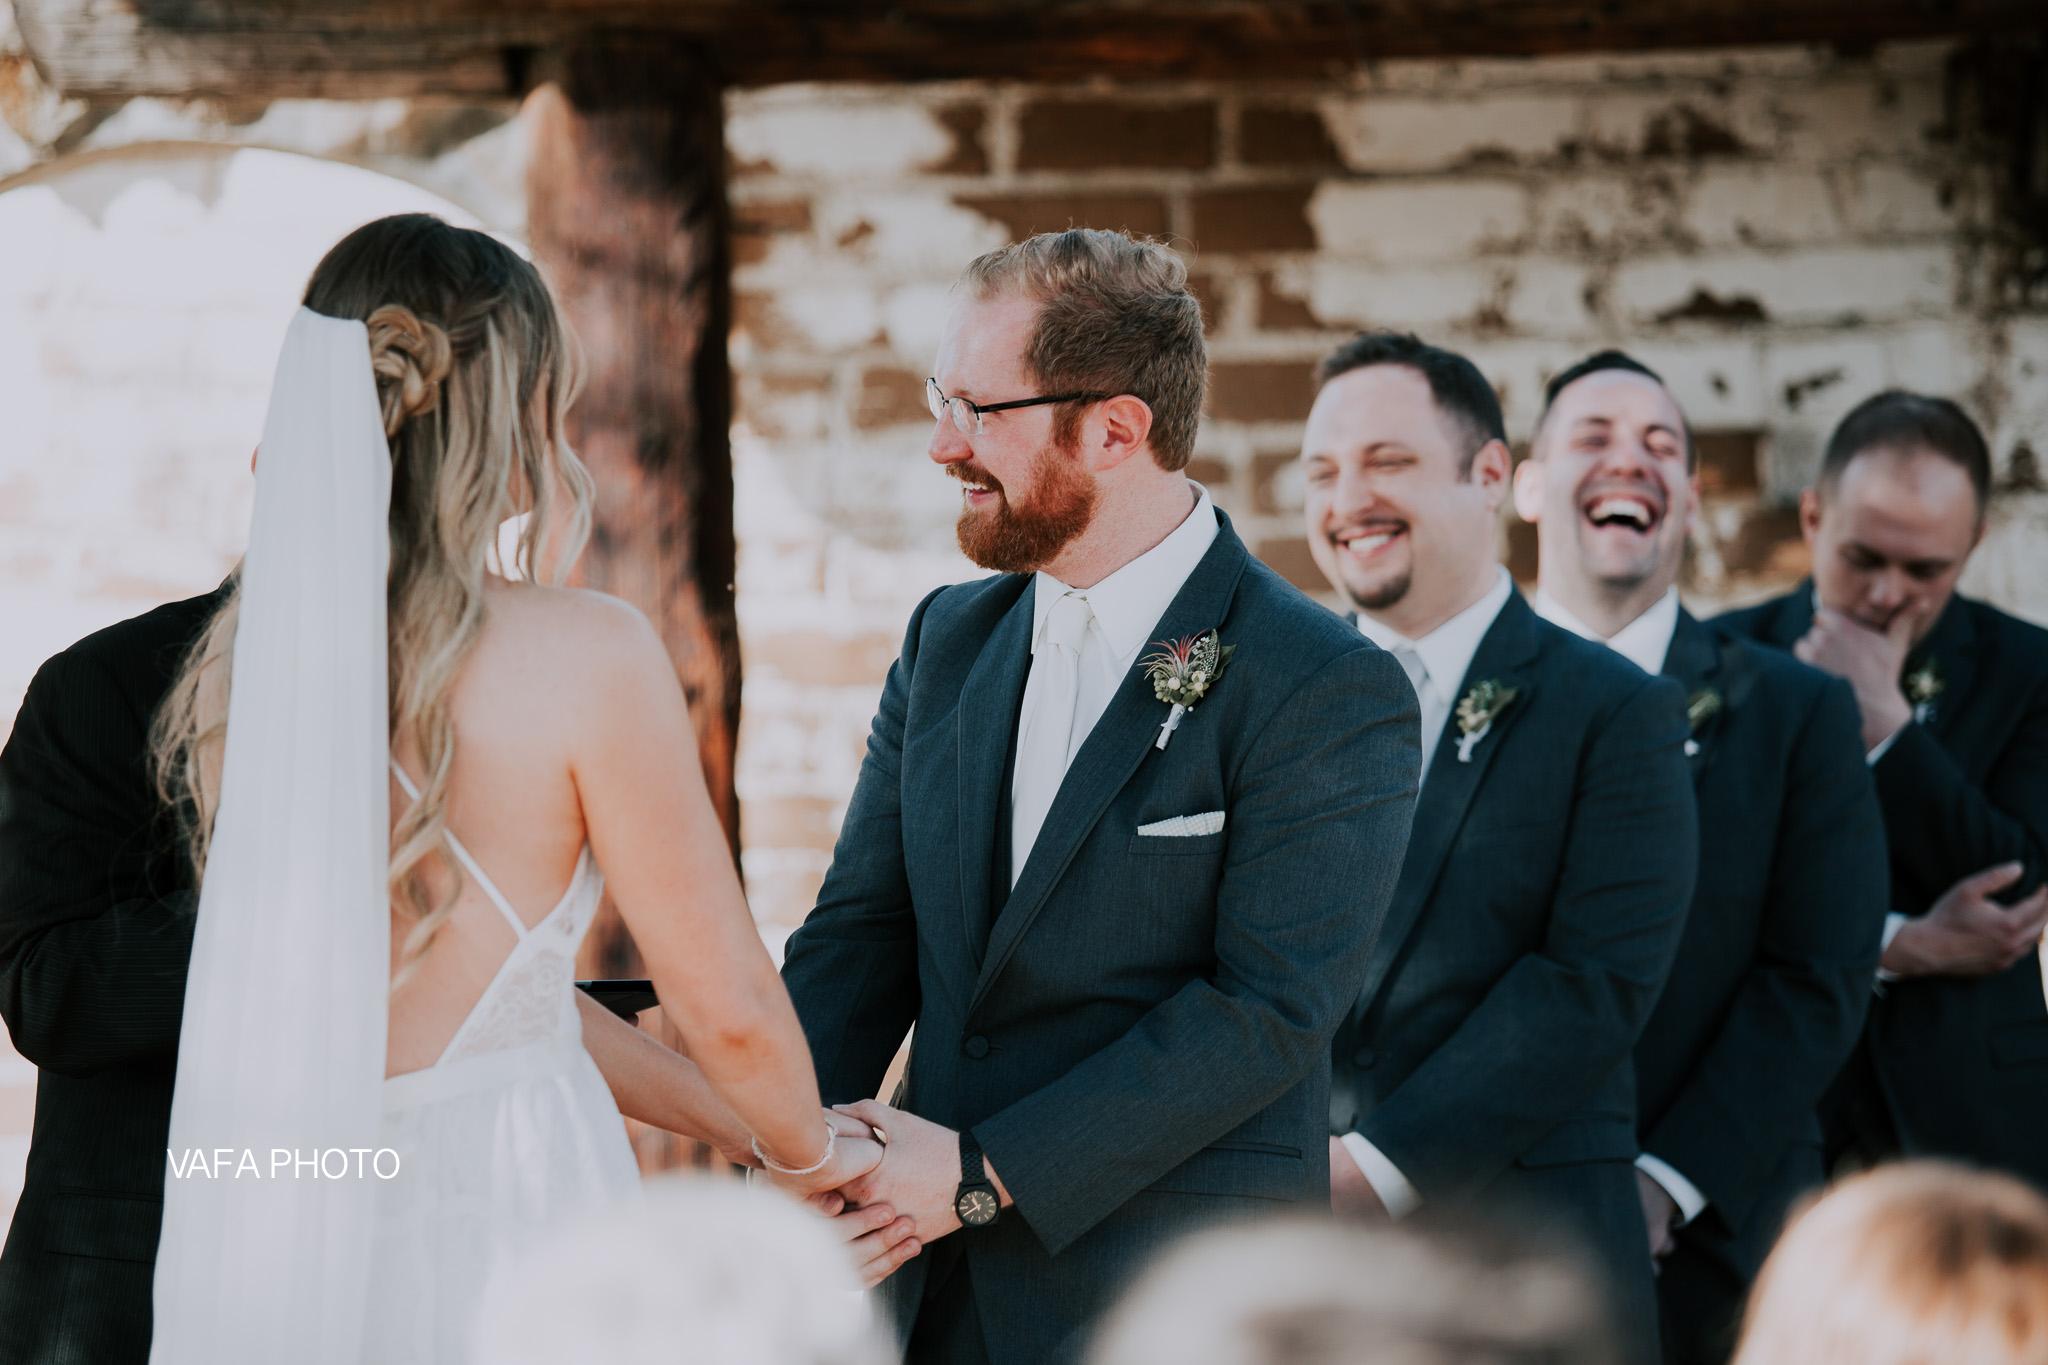 Leo-Carrillo-Ranch-Wedding-Lauren-Mike-Vafa-Photo-583.jpg